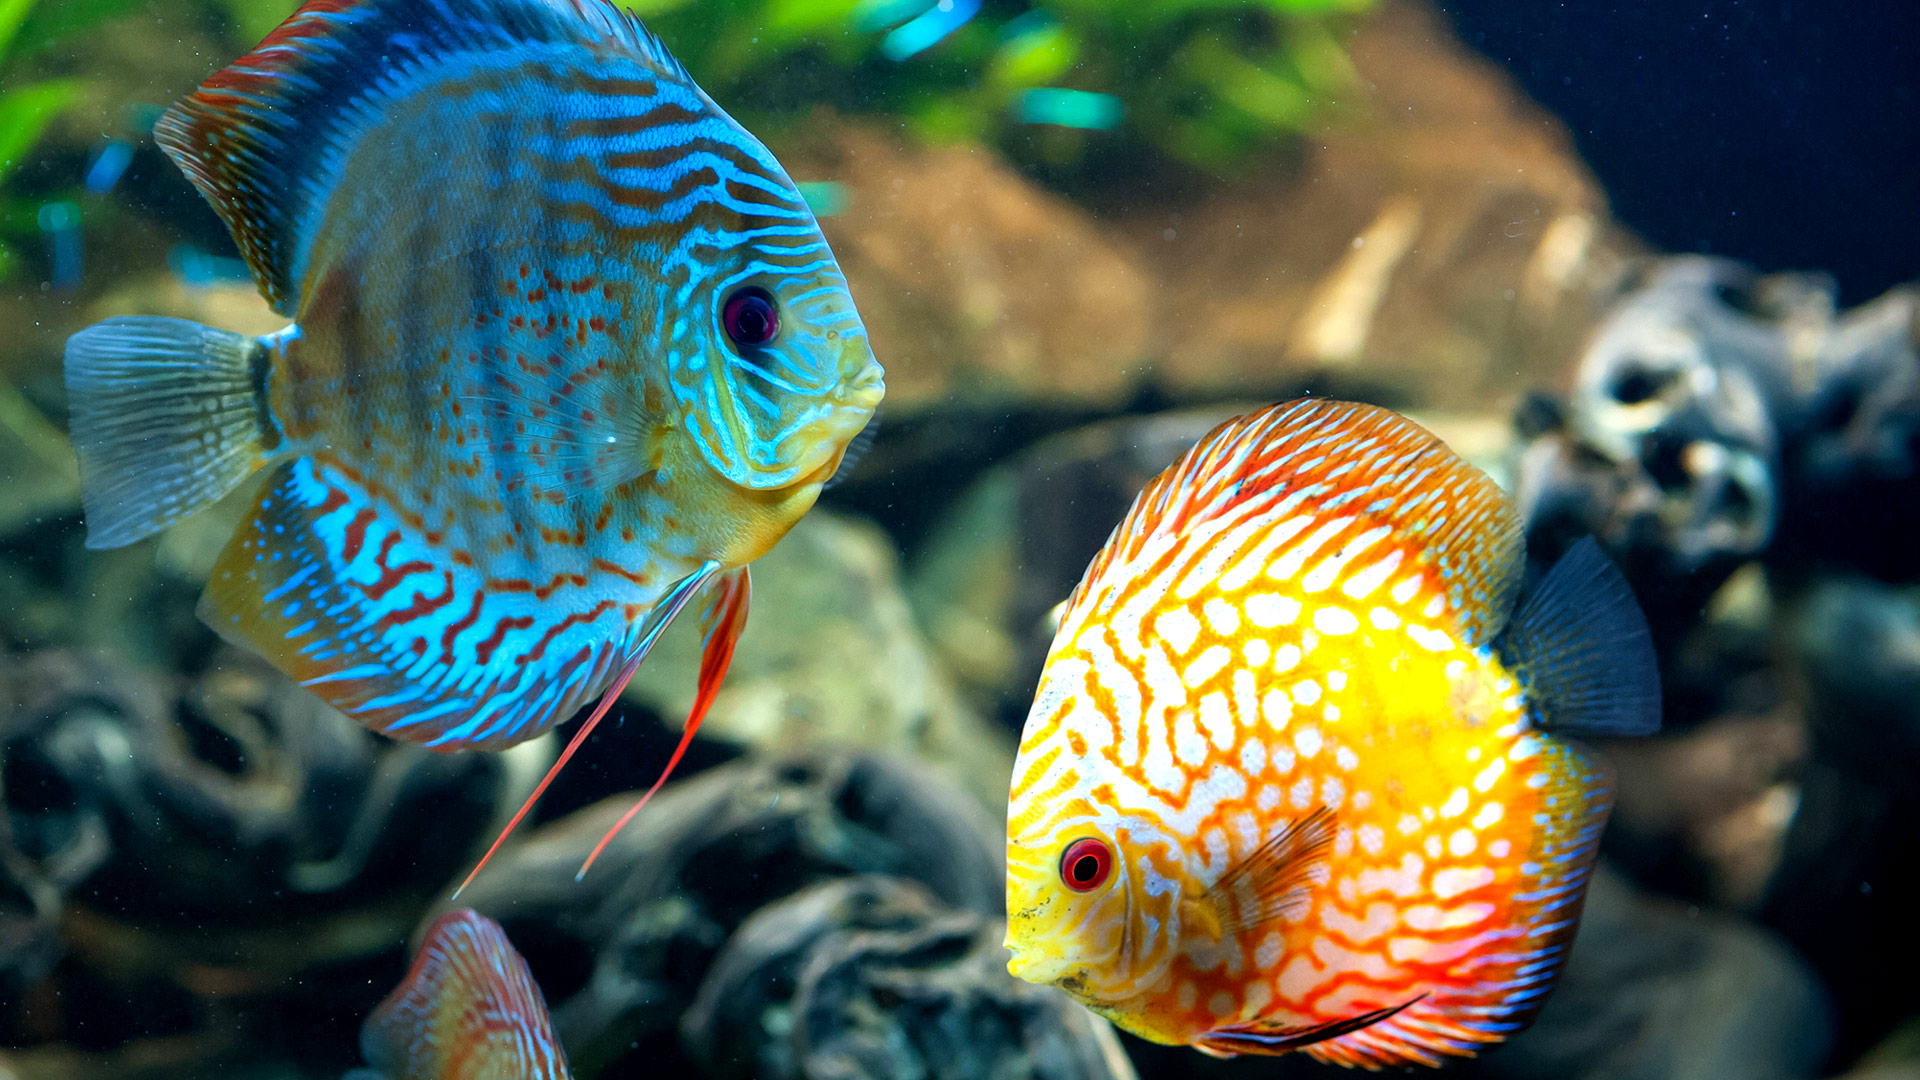 Download Fish HD Wallpapers for your Desktop Tablet Mac Laptop 1920x1080